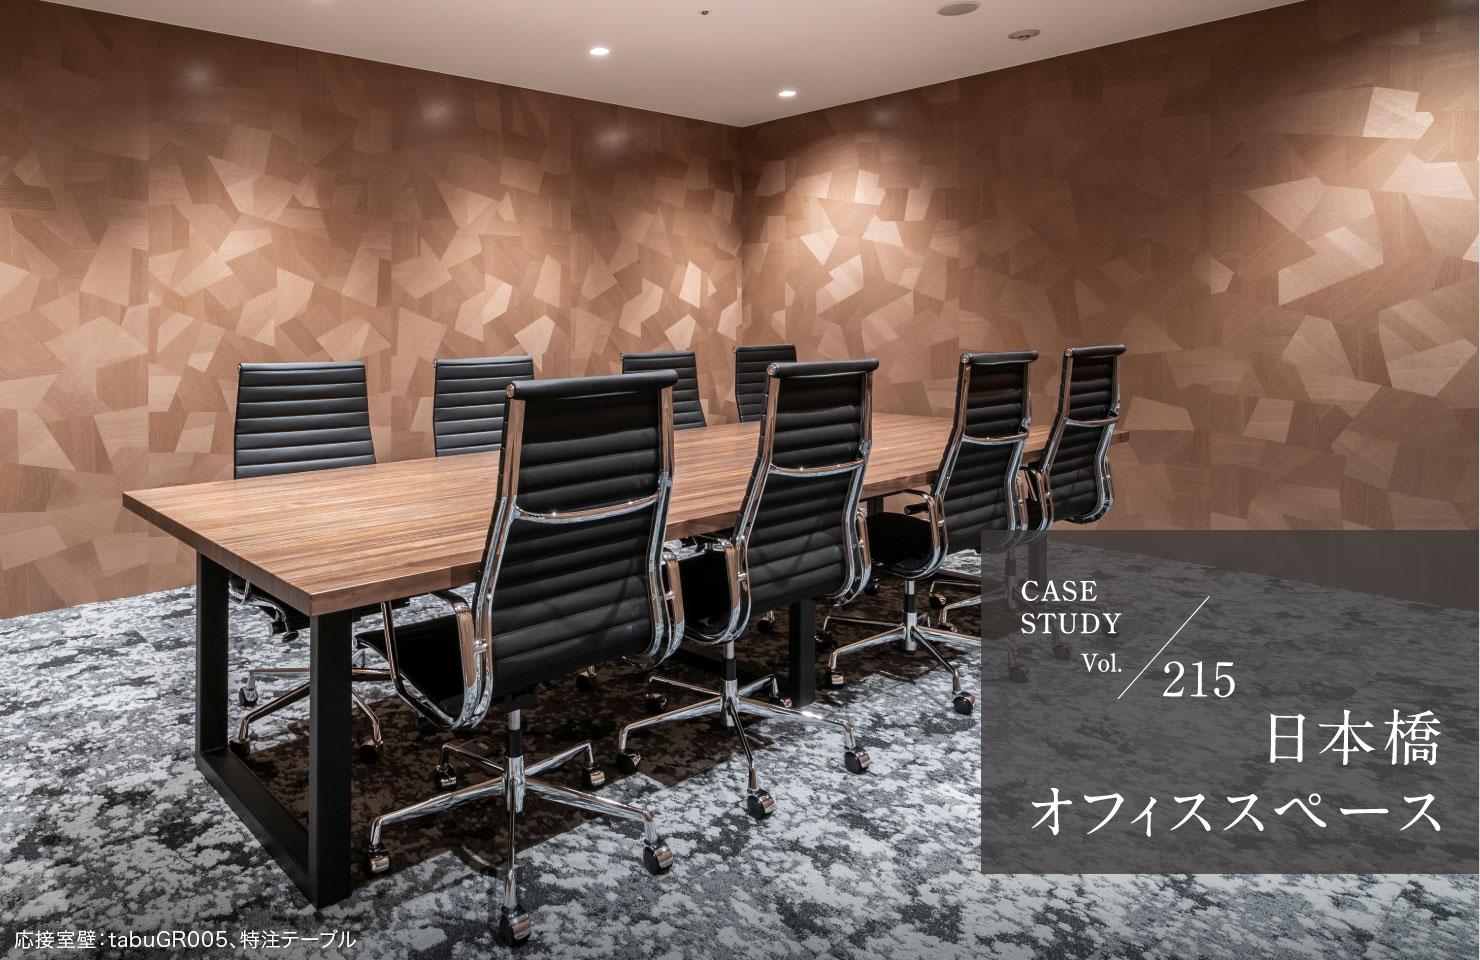 CASE STUDY Vol.25 日本橋オフィススペース